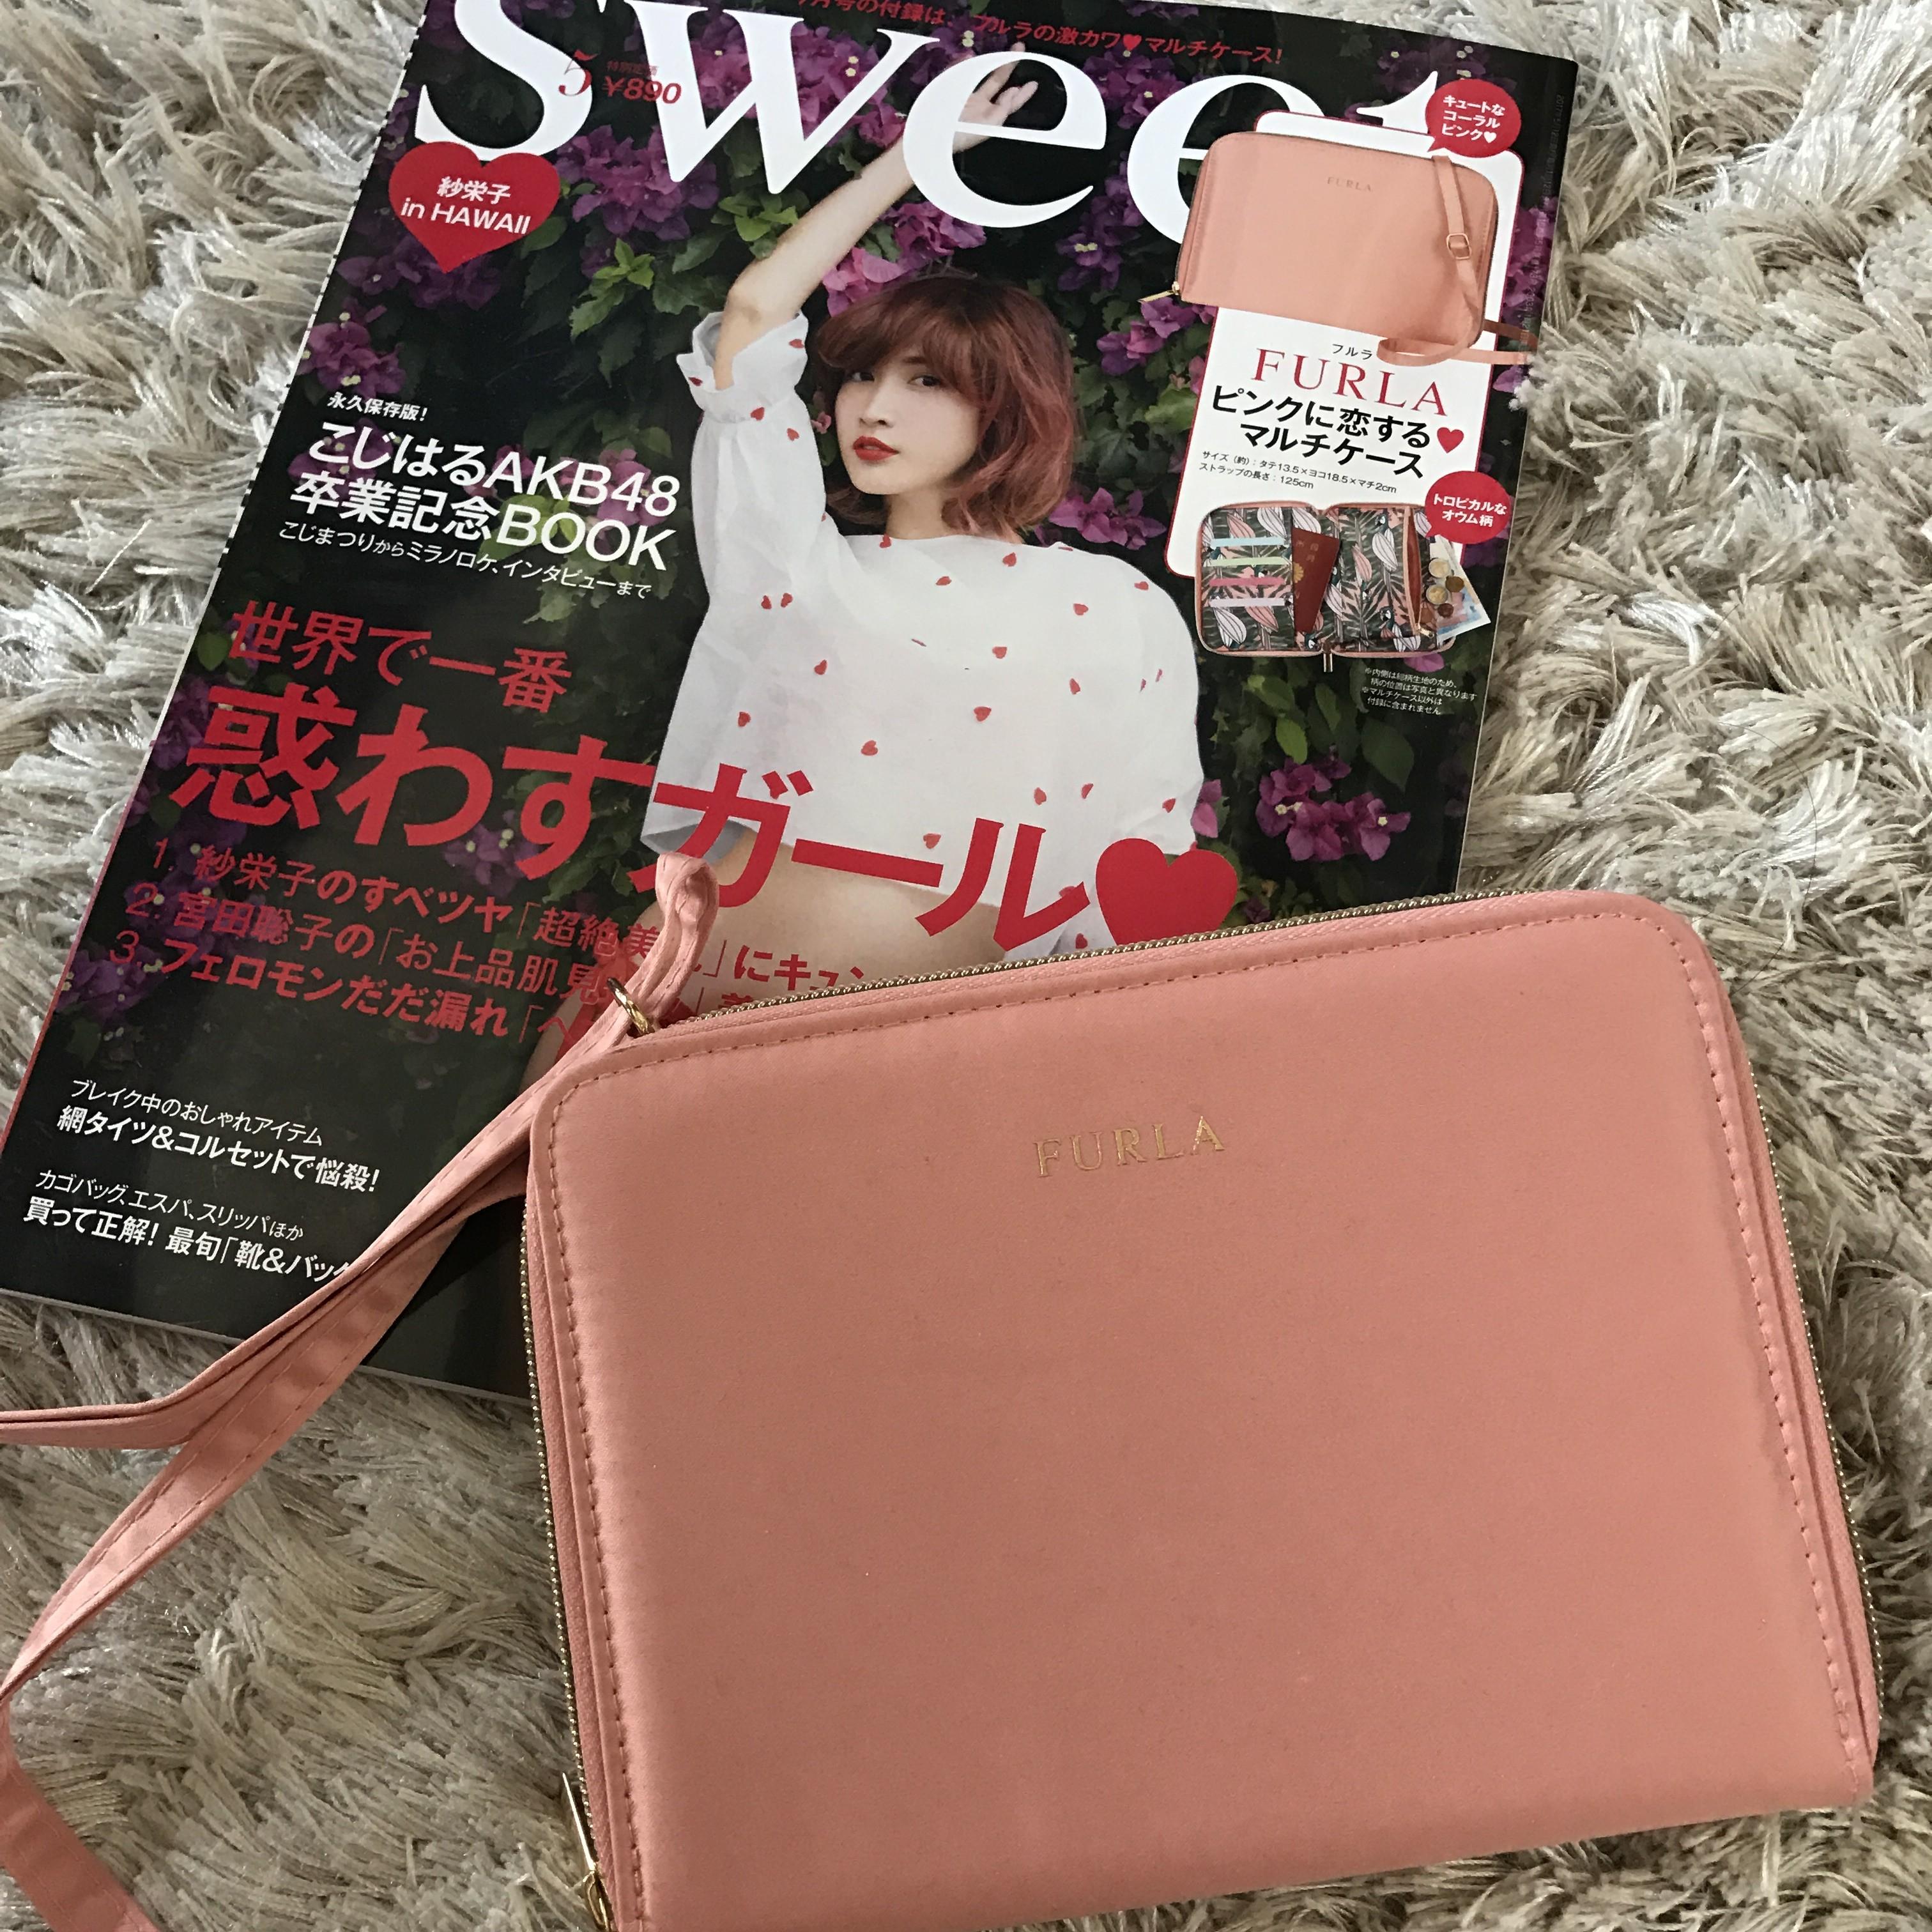 GWの旅行に便利!Sweet5月号のマルチケース【雑誌付録】